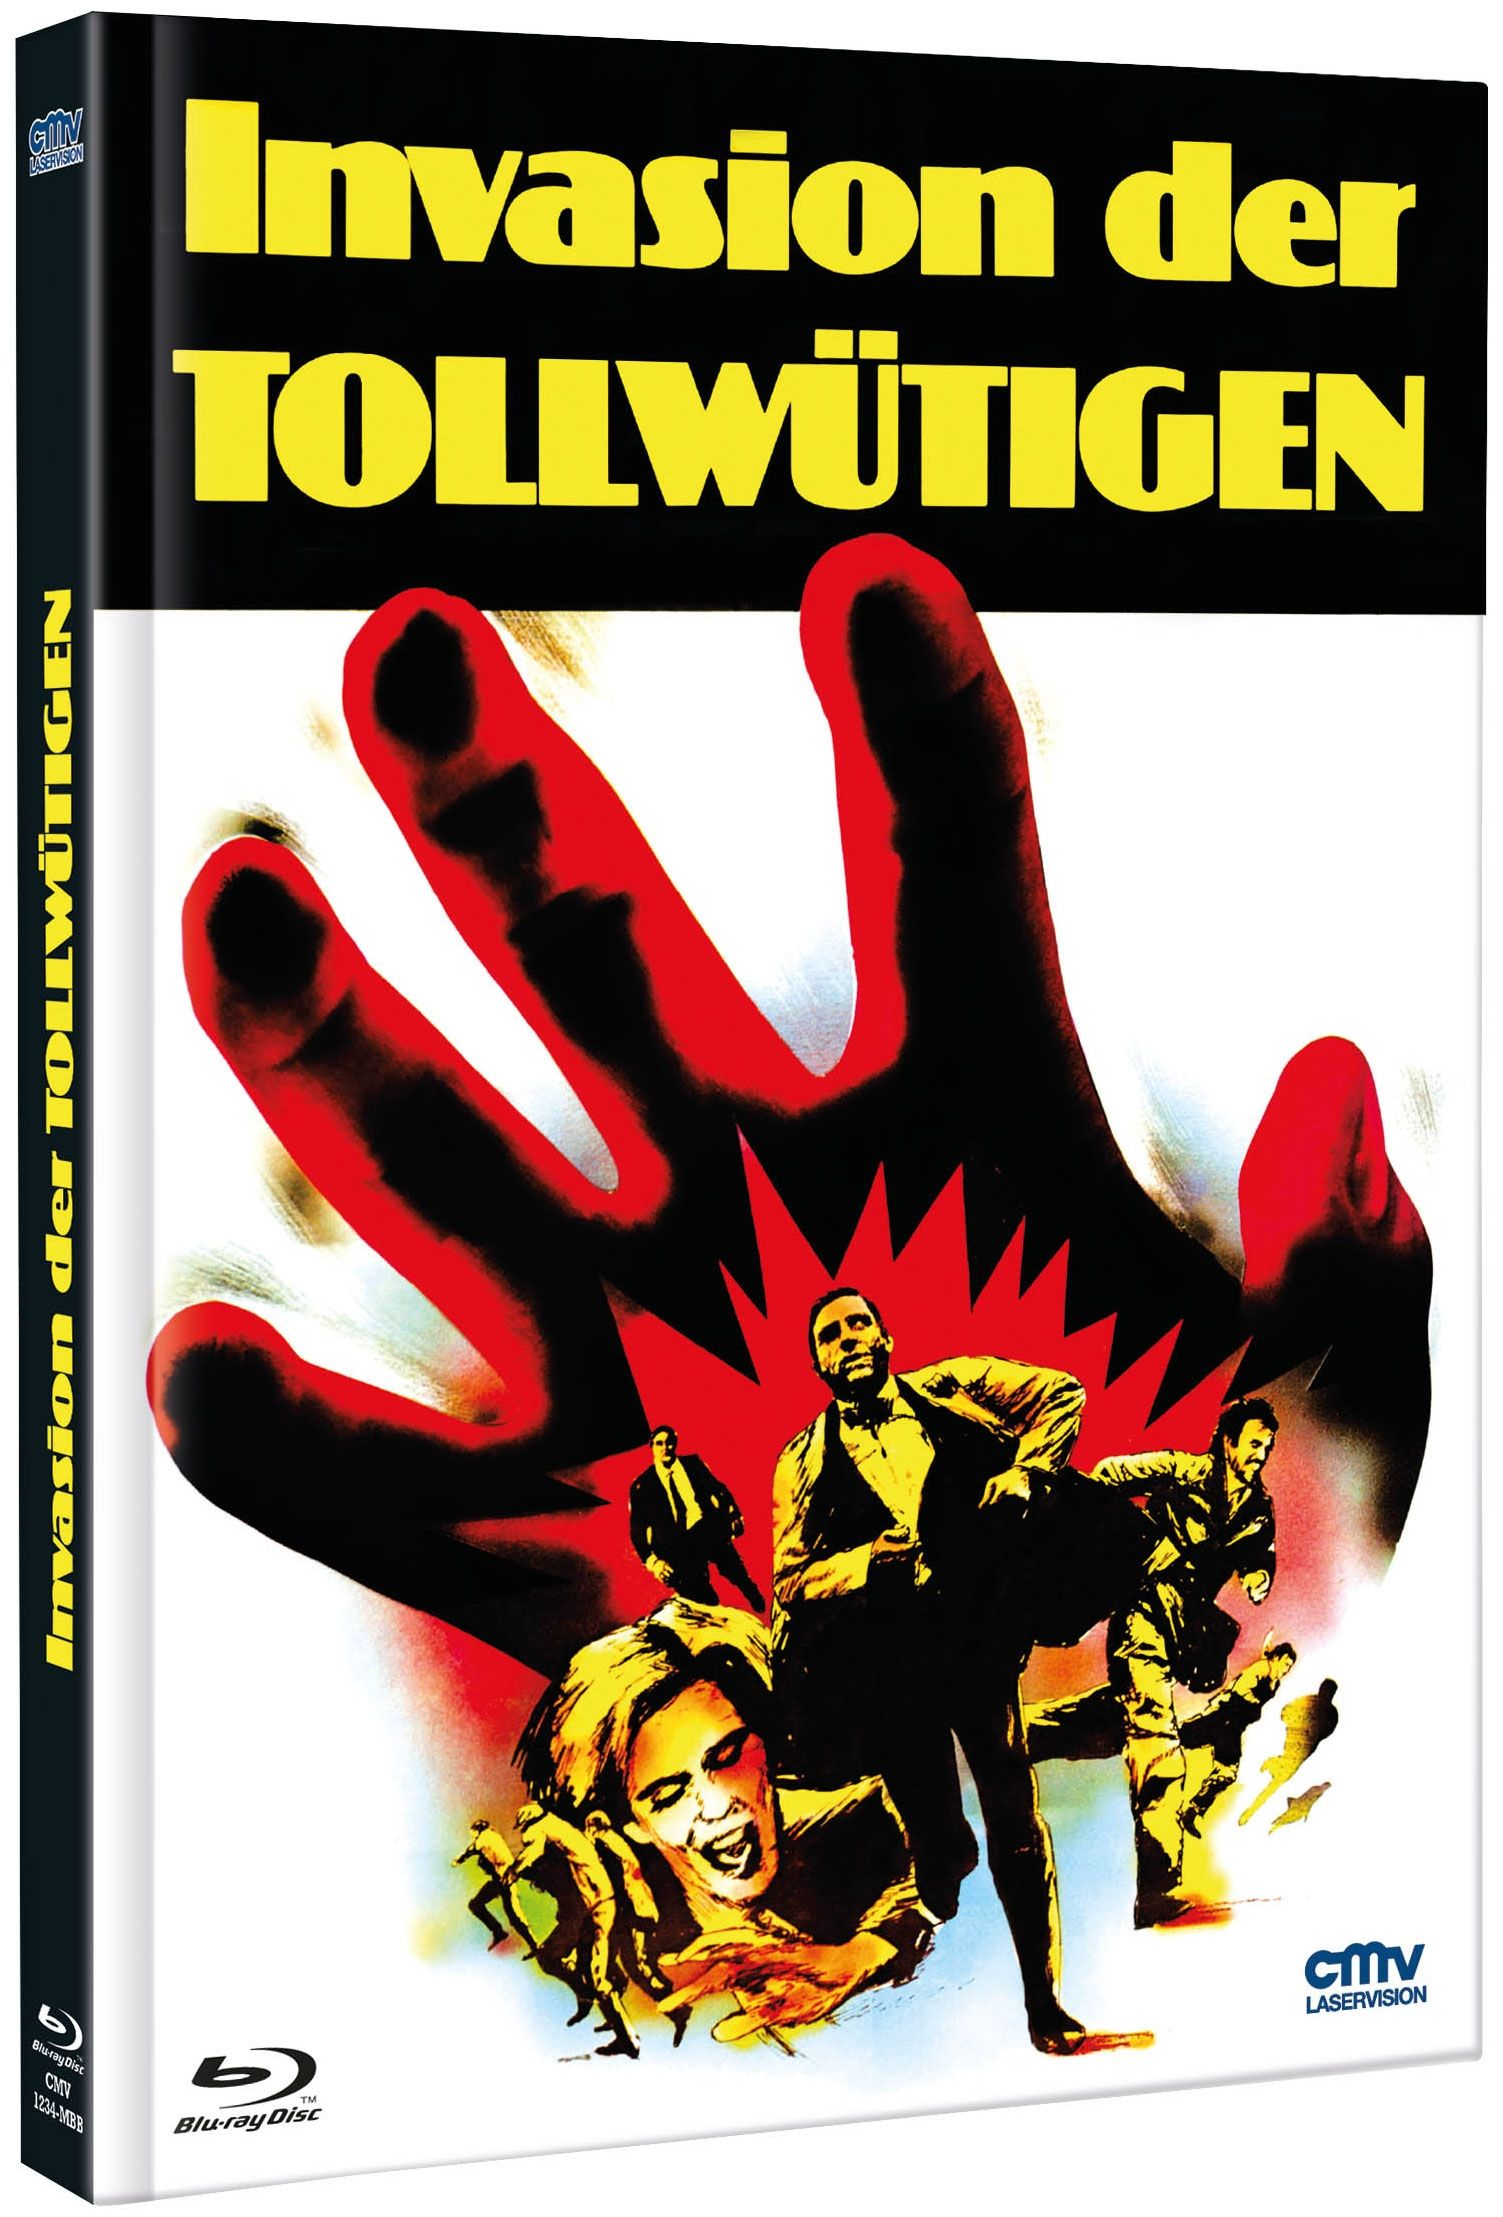 Invasion der Blutfarmer (Lim. Uncut Mediabook - Cover B) (DVD + BLURAY)